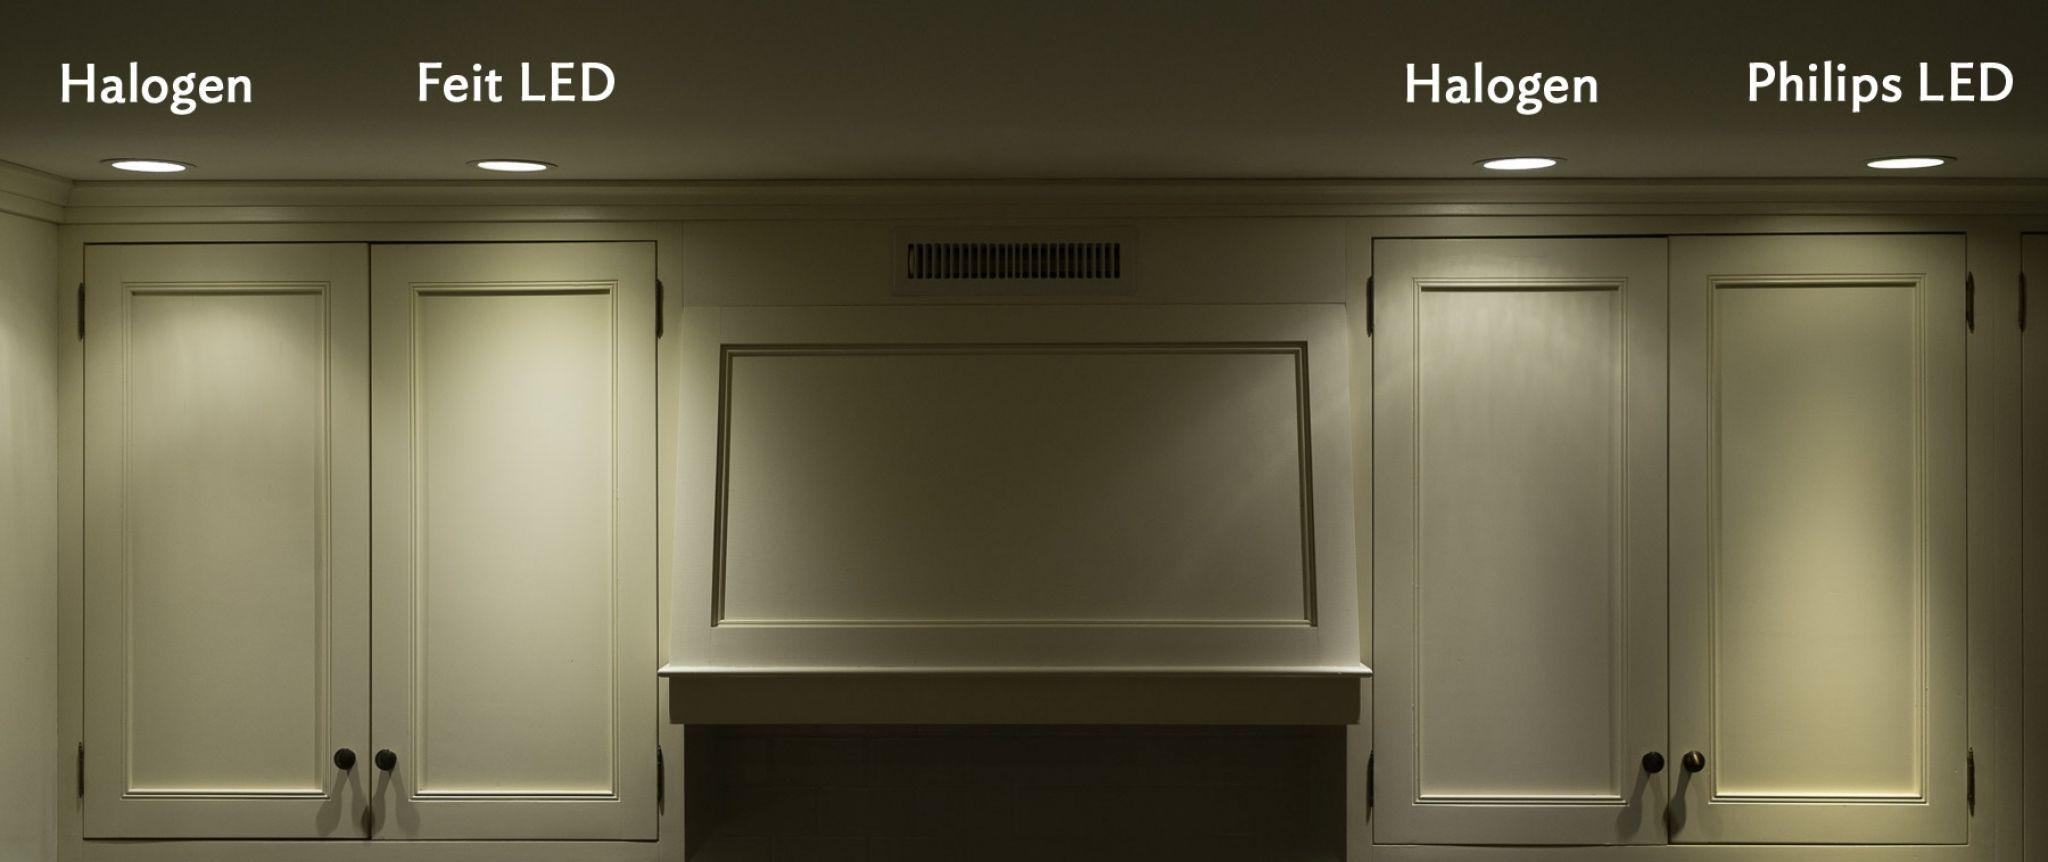 Outdoor Lighting Led Vs Halogen Best Interior Wall Paint Check More At Http Www Mtbasics Com Outdoor Lightin Led Pot Lights Pot Lights Led Outdoor Lighting